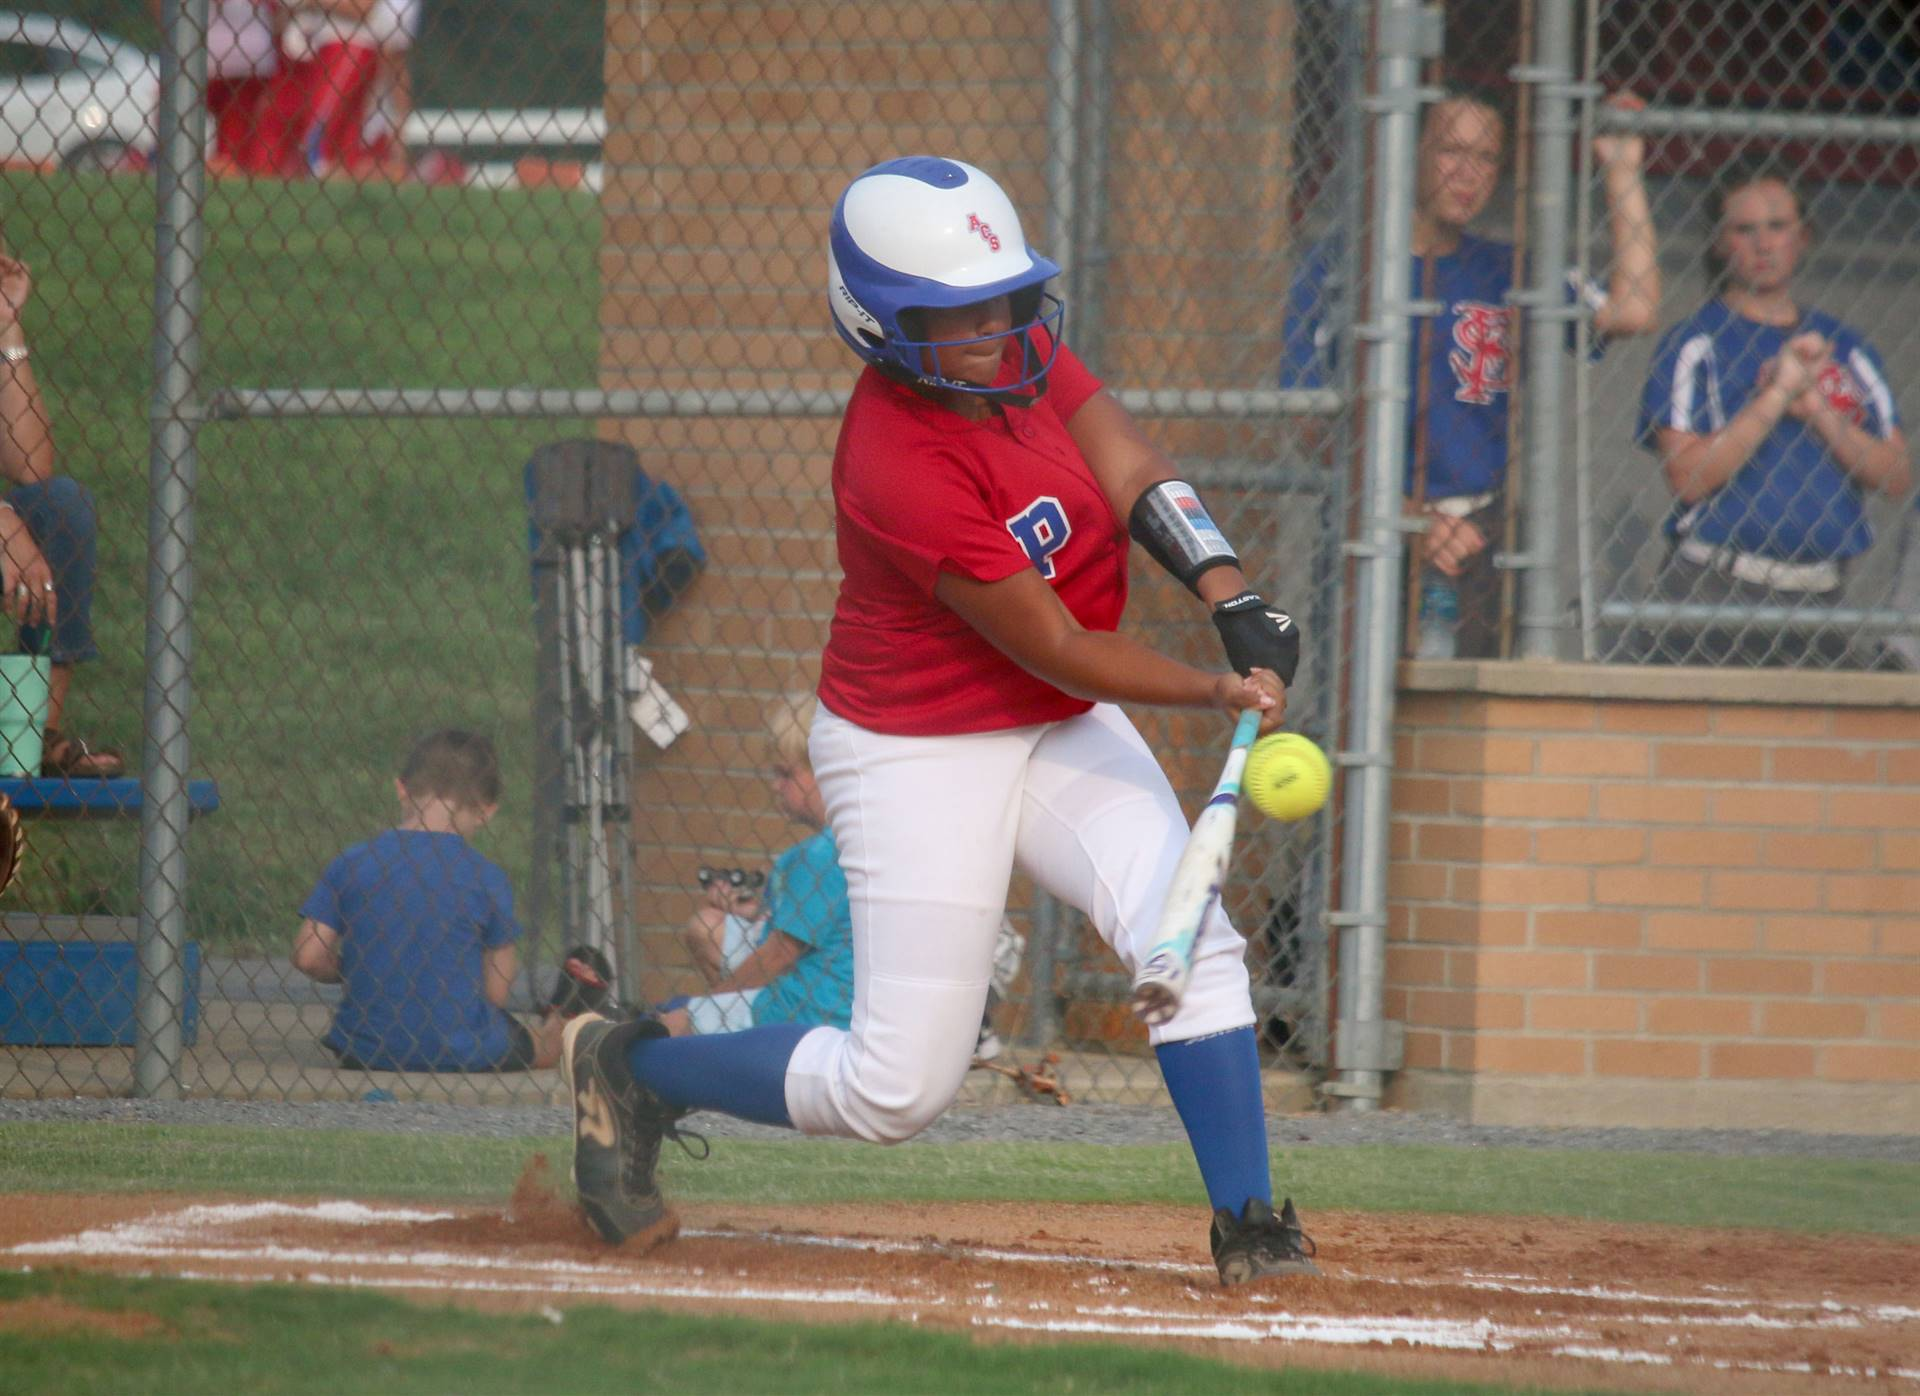 softball hitter